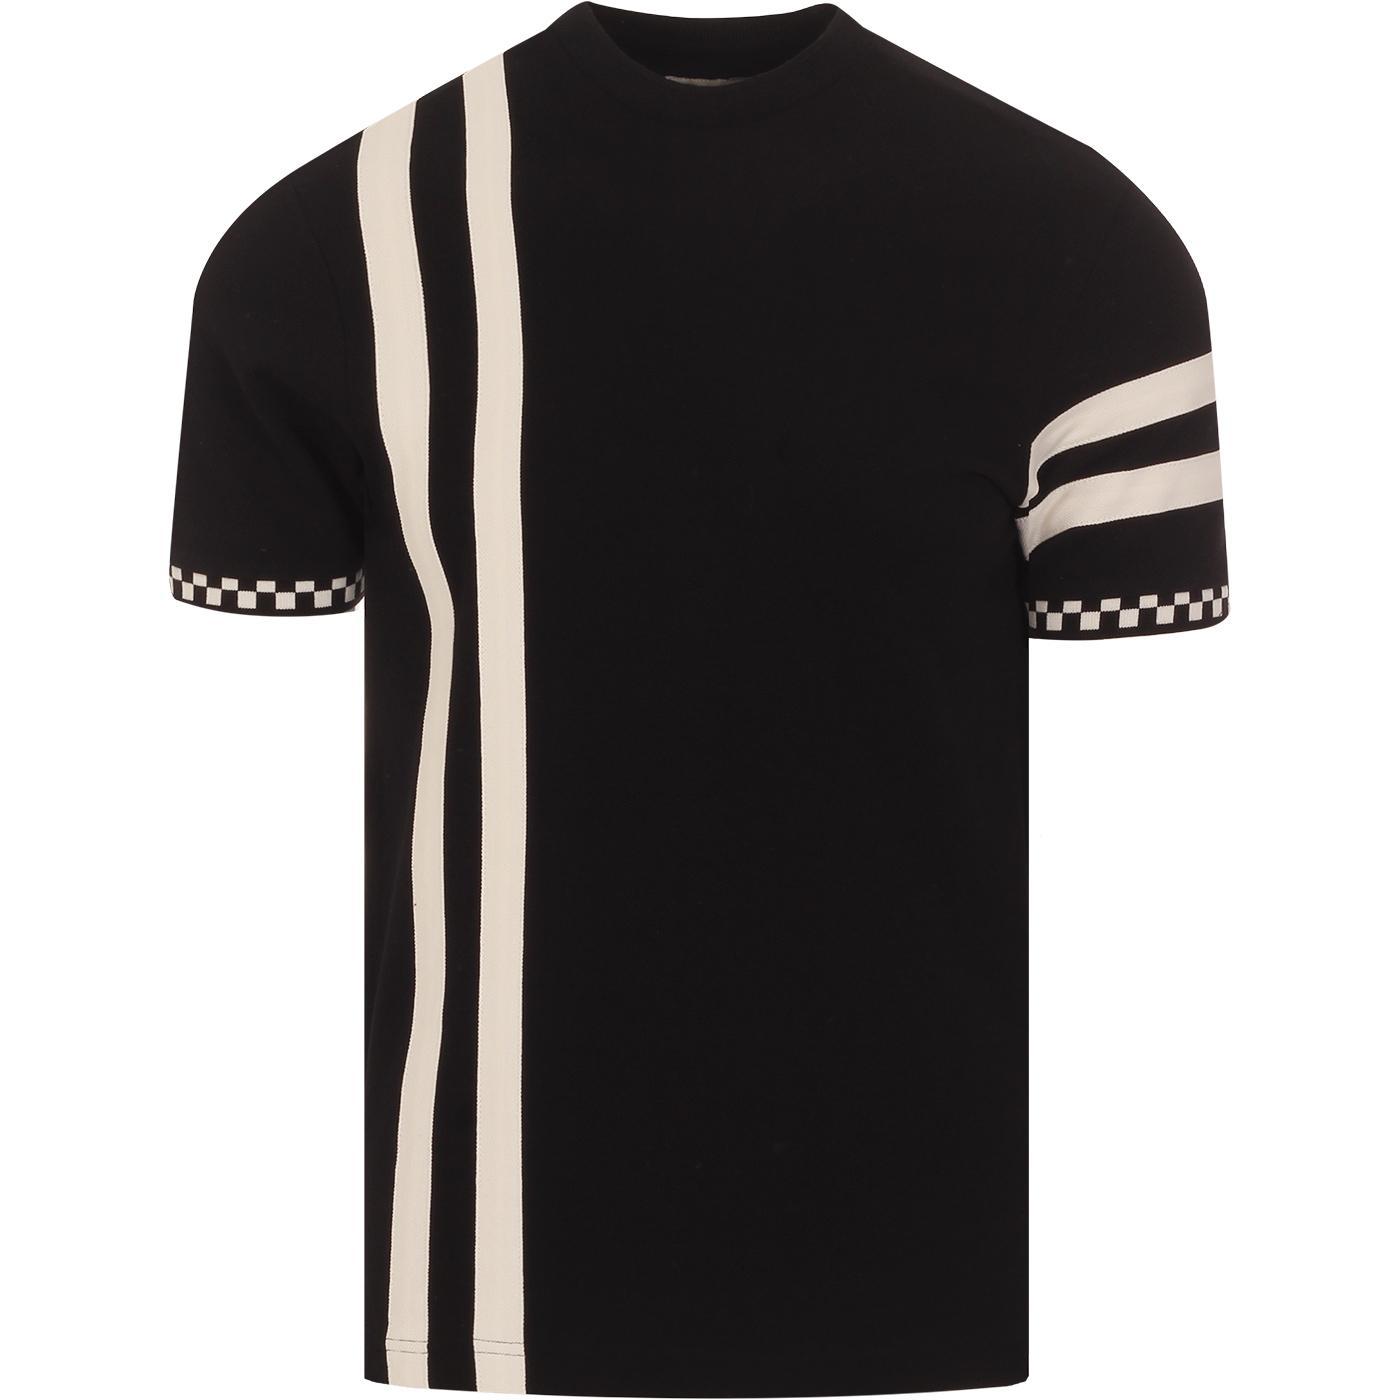 SKA & SOUL Mod Checkerboard Racing Stripe Tee (B)